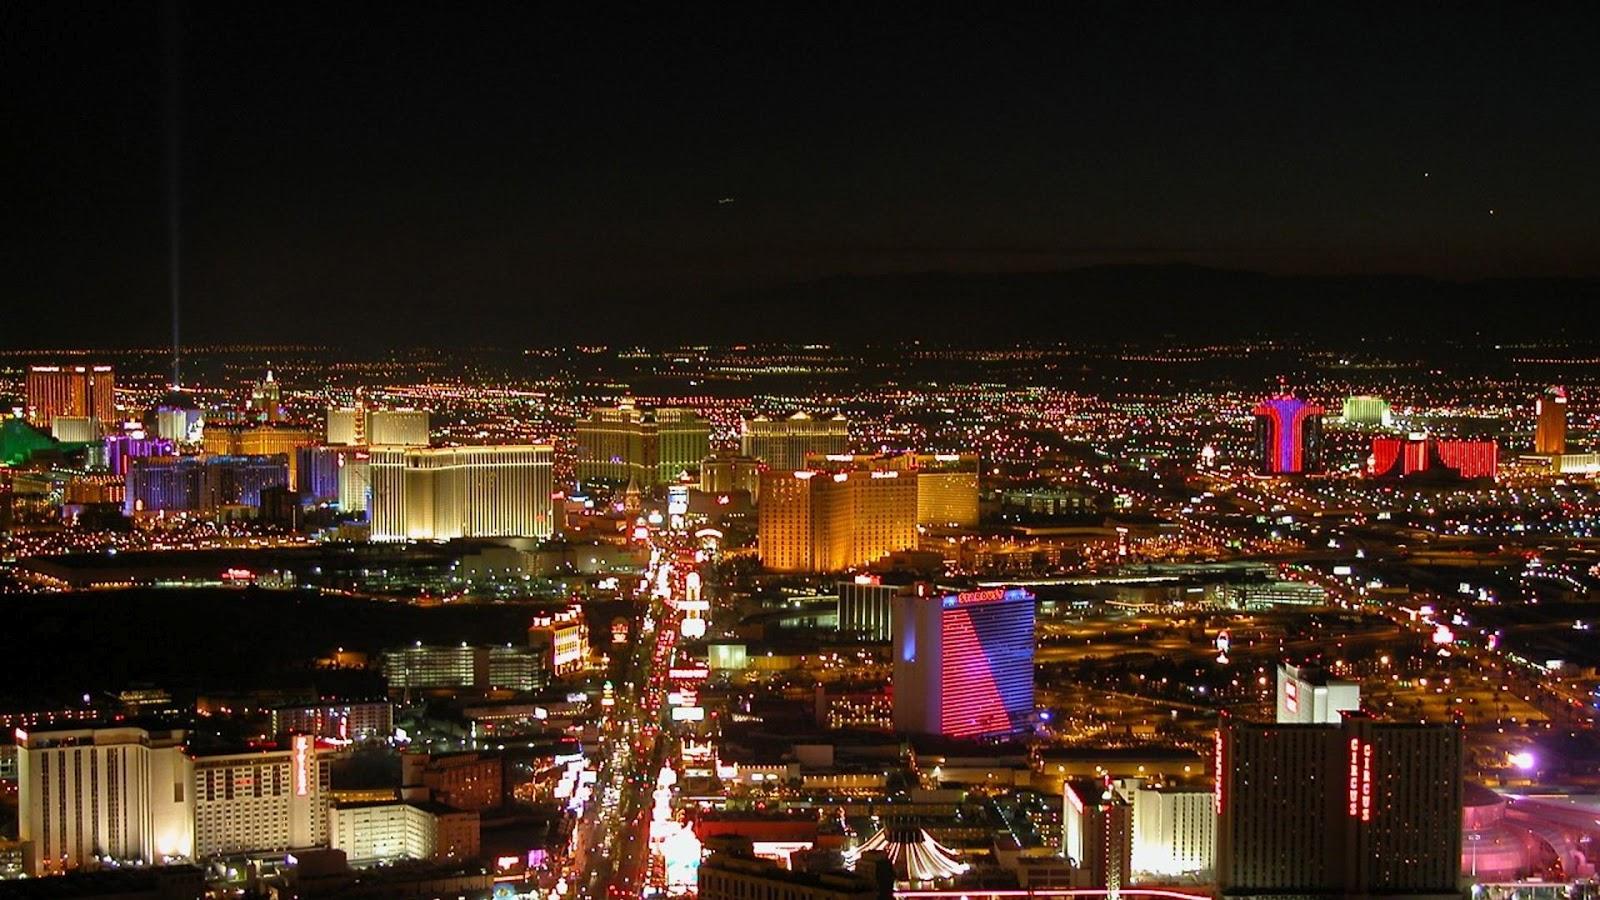 http://4.bp.blogspot.com/-3qCvmg8bGiA/UA0OVsR6_pI/AAAAAAAAAE4/OVC7HBbxzsQ/s1600/las-vegas-night-world-famous-landmarks-city-1080x1920.jpg